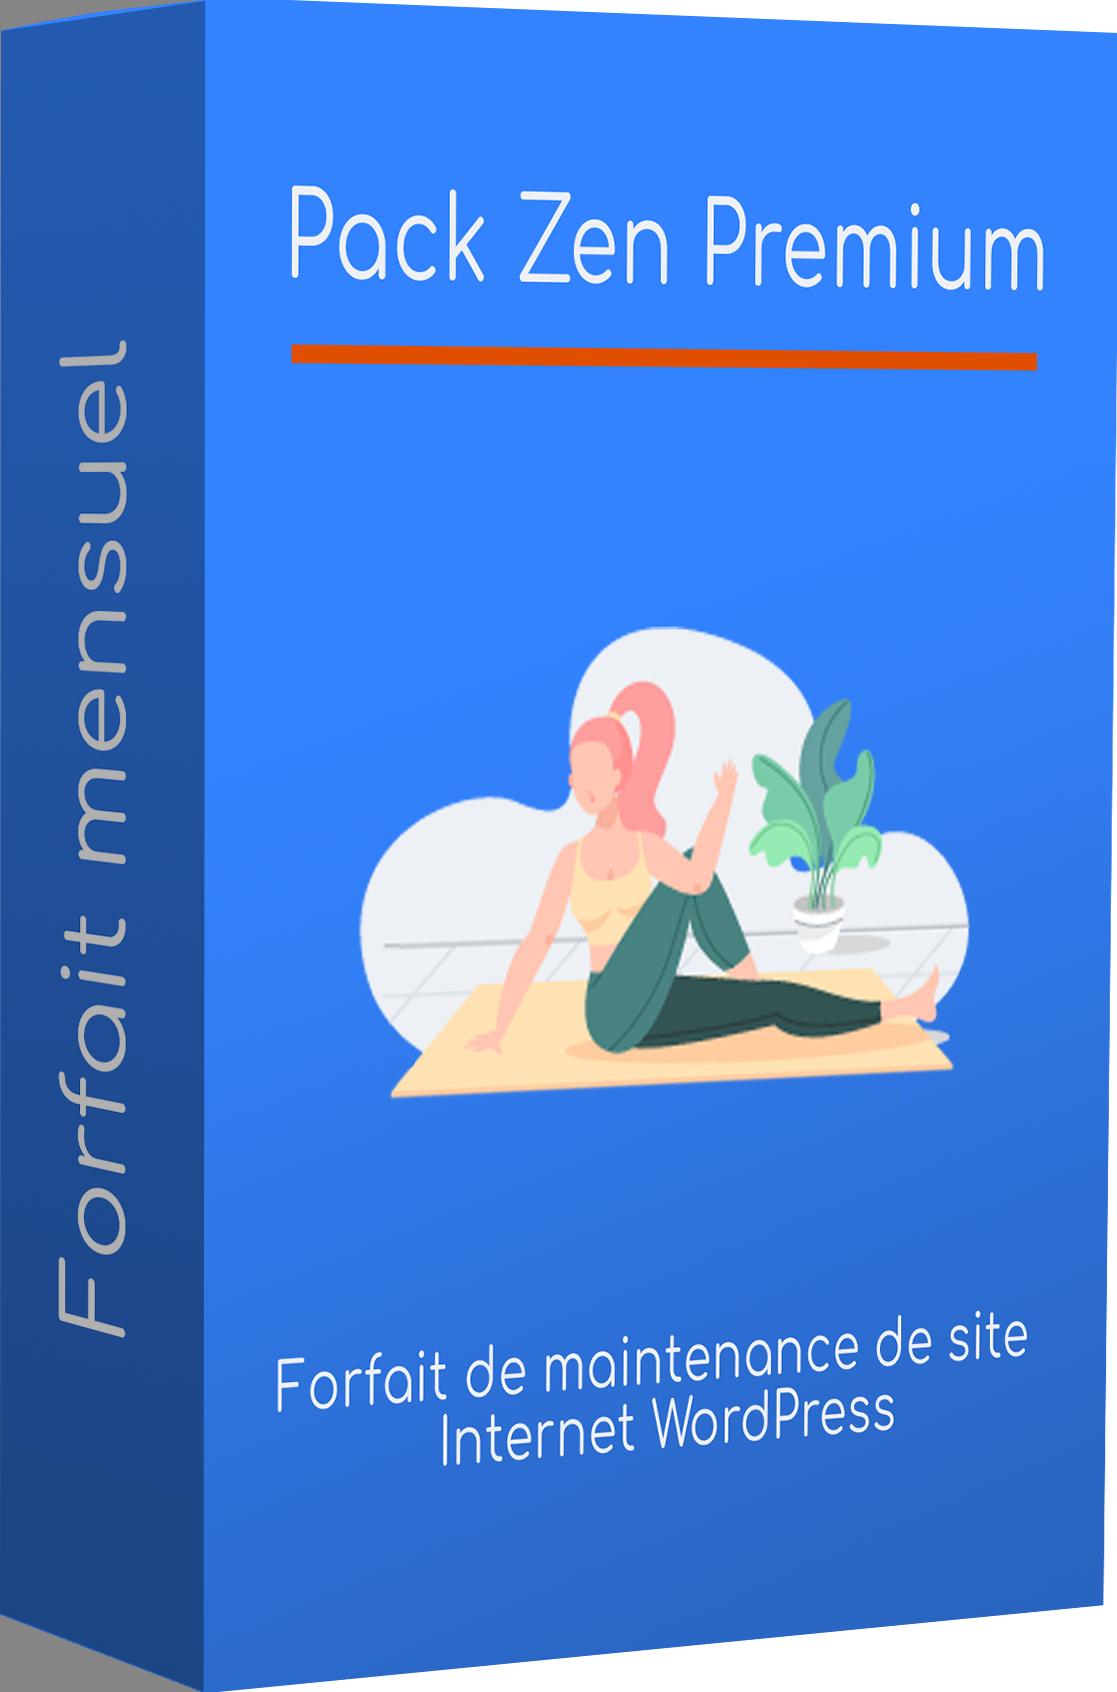 forfait maintenance wordpress pack zen premium updoze